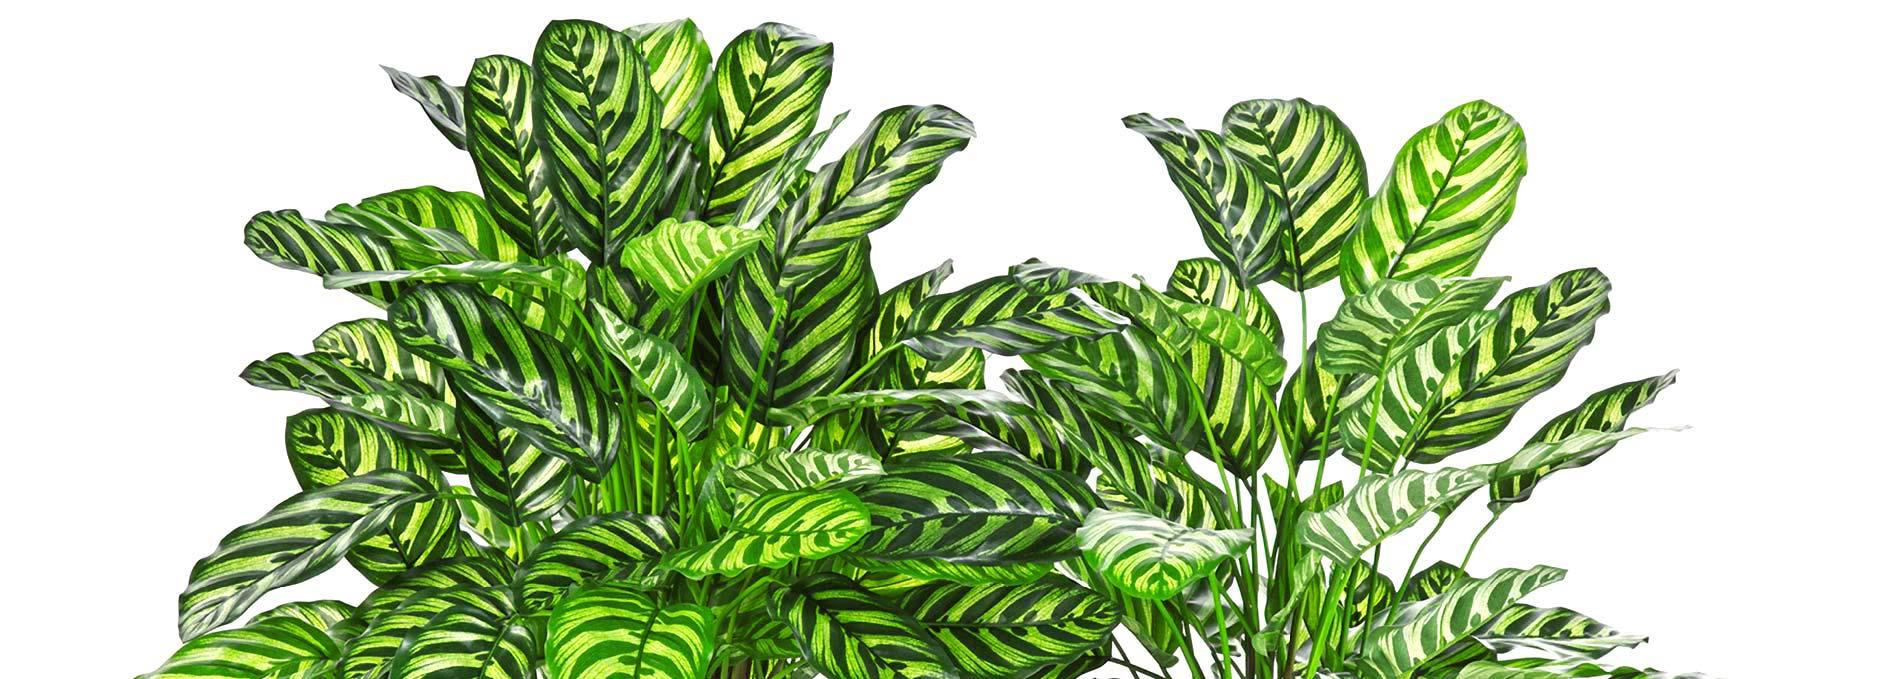 Darden-Importacao_Producao_Comercializacao-de-Plantas-e-Arvores-Artificiais_Banner-12